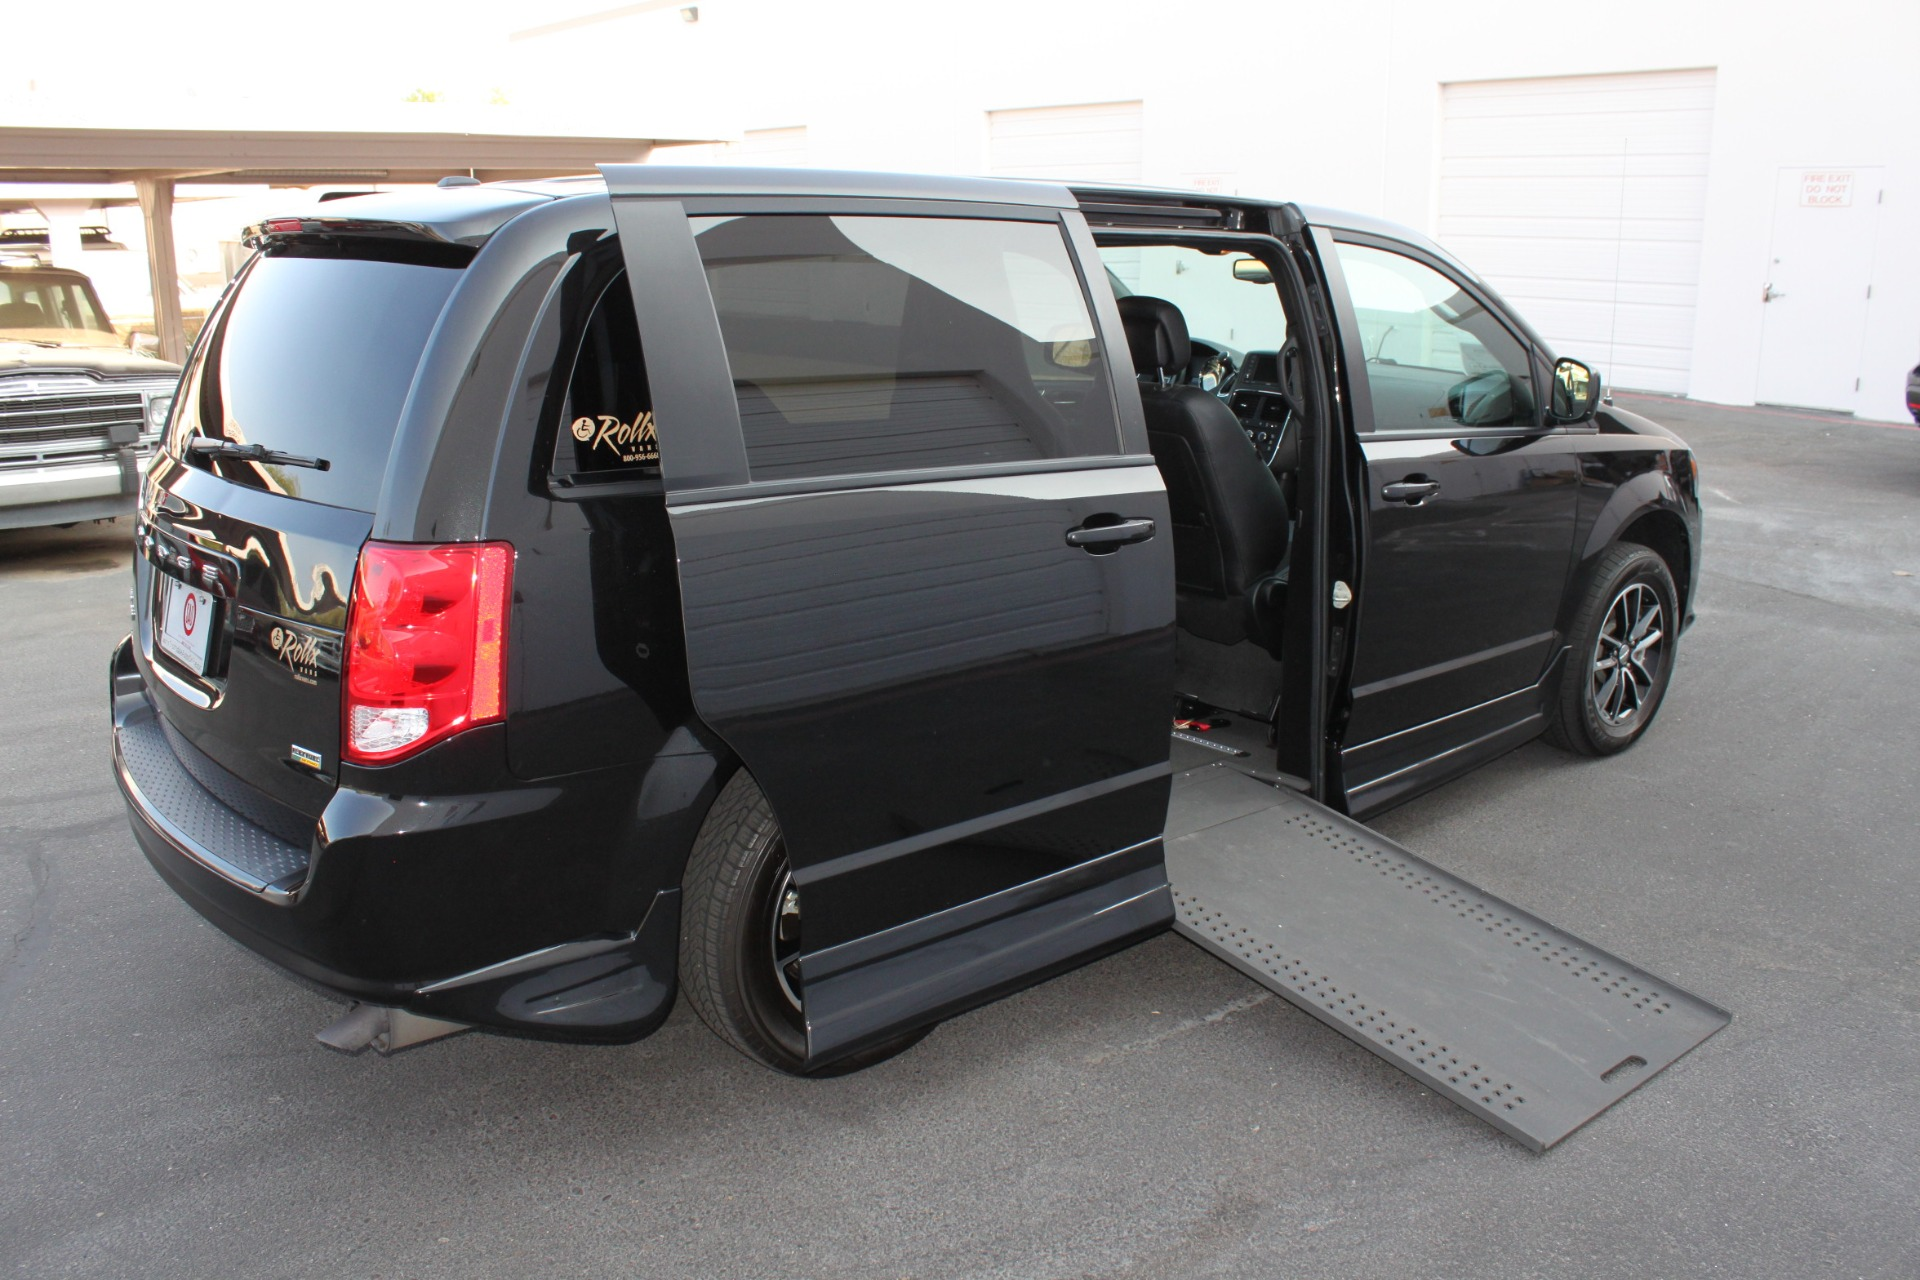 Used-2018-Dodge-Grand-Caravan-SXT-Rollx-Mobility-Conversion-Mini